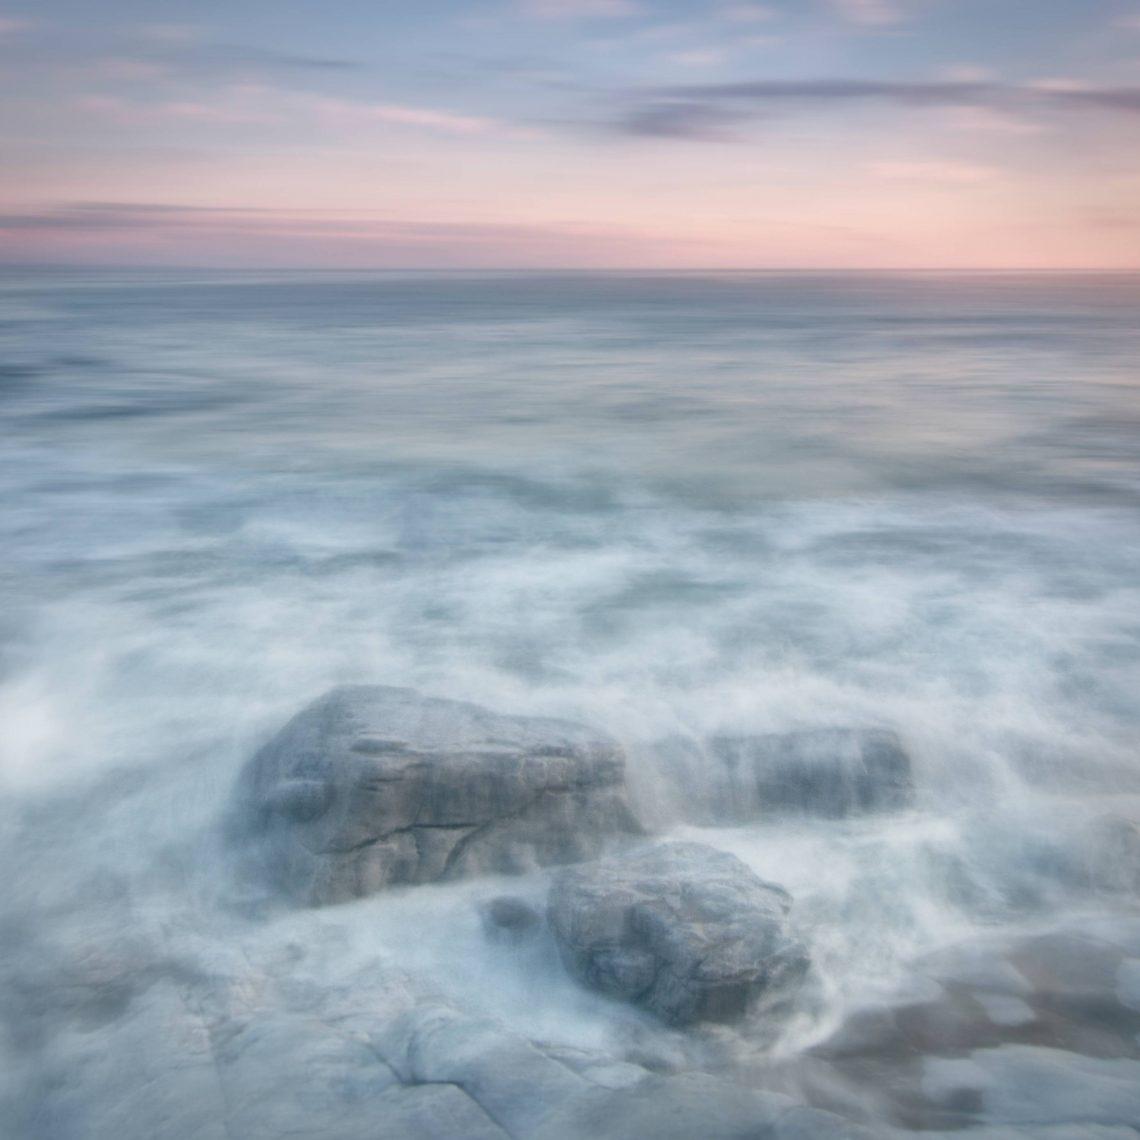 6_Serene Seaside Impression